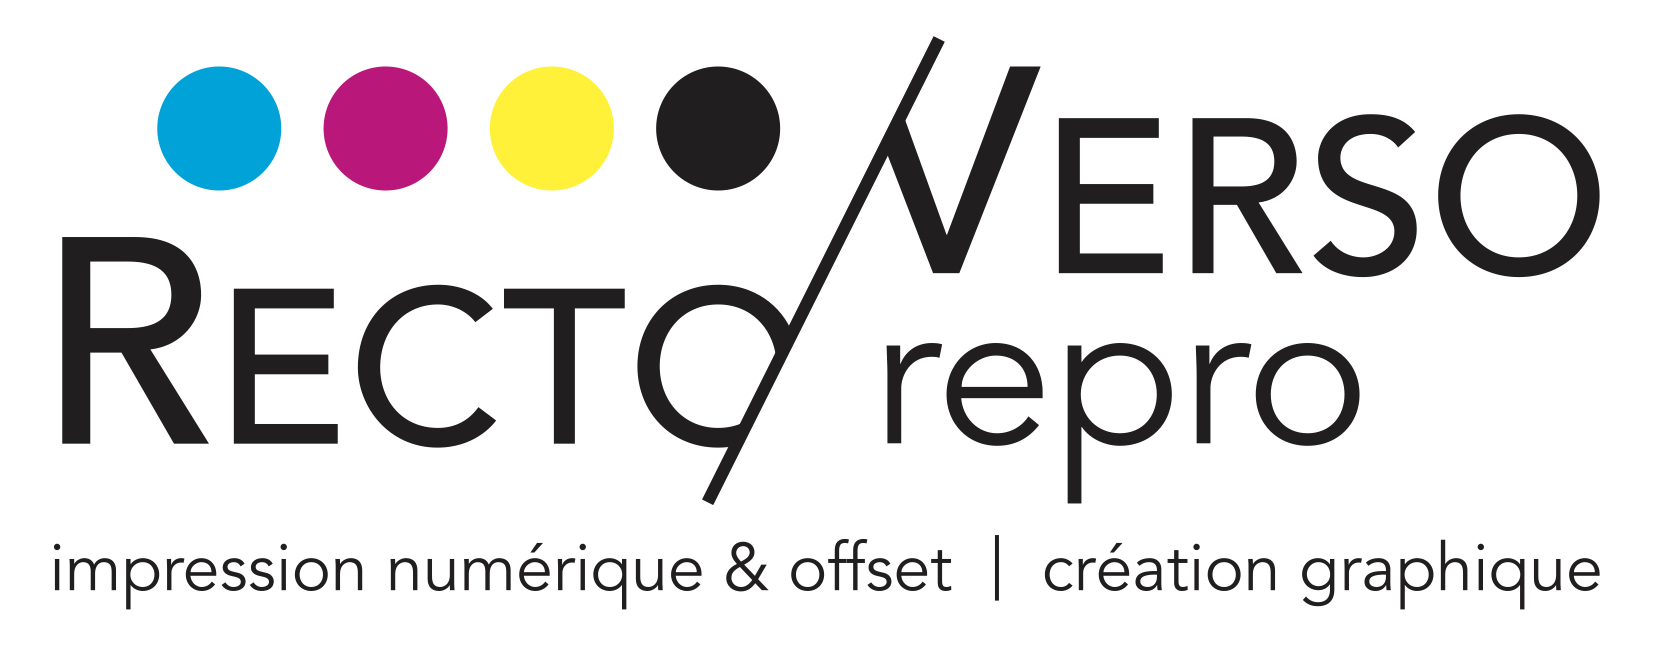 imprimerie-valley et rv-repro